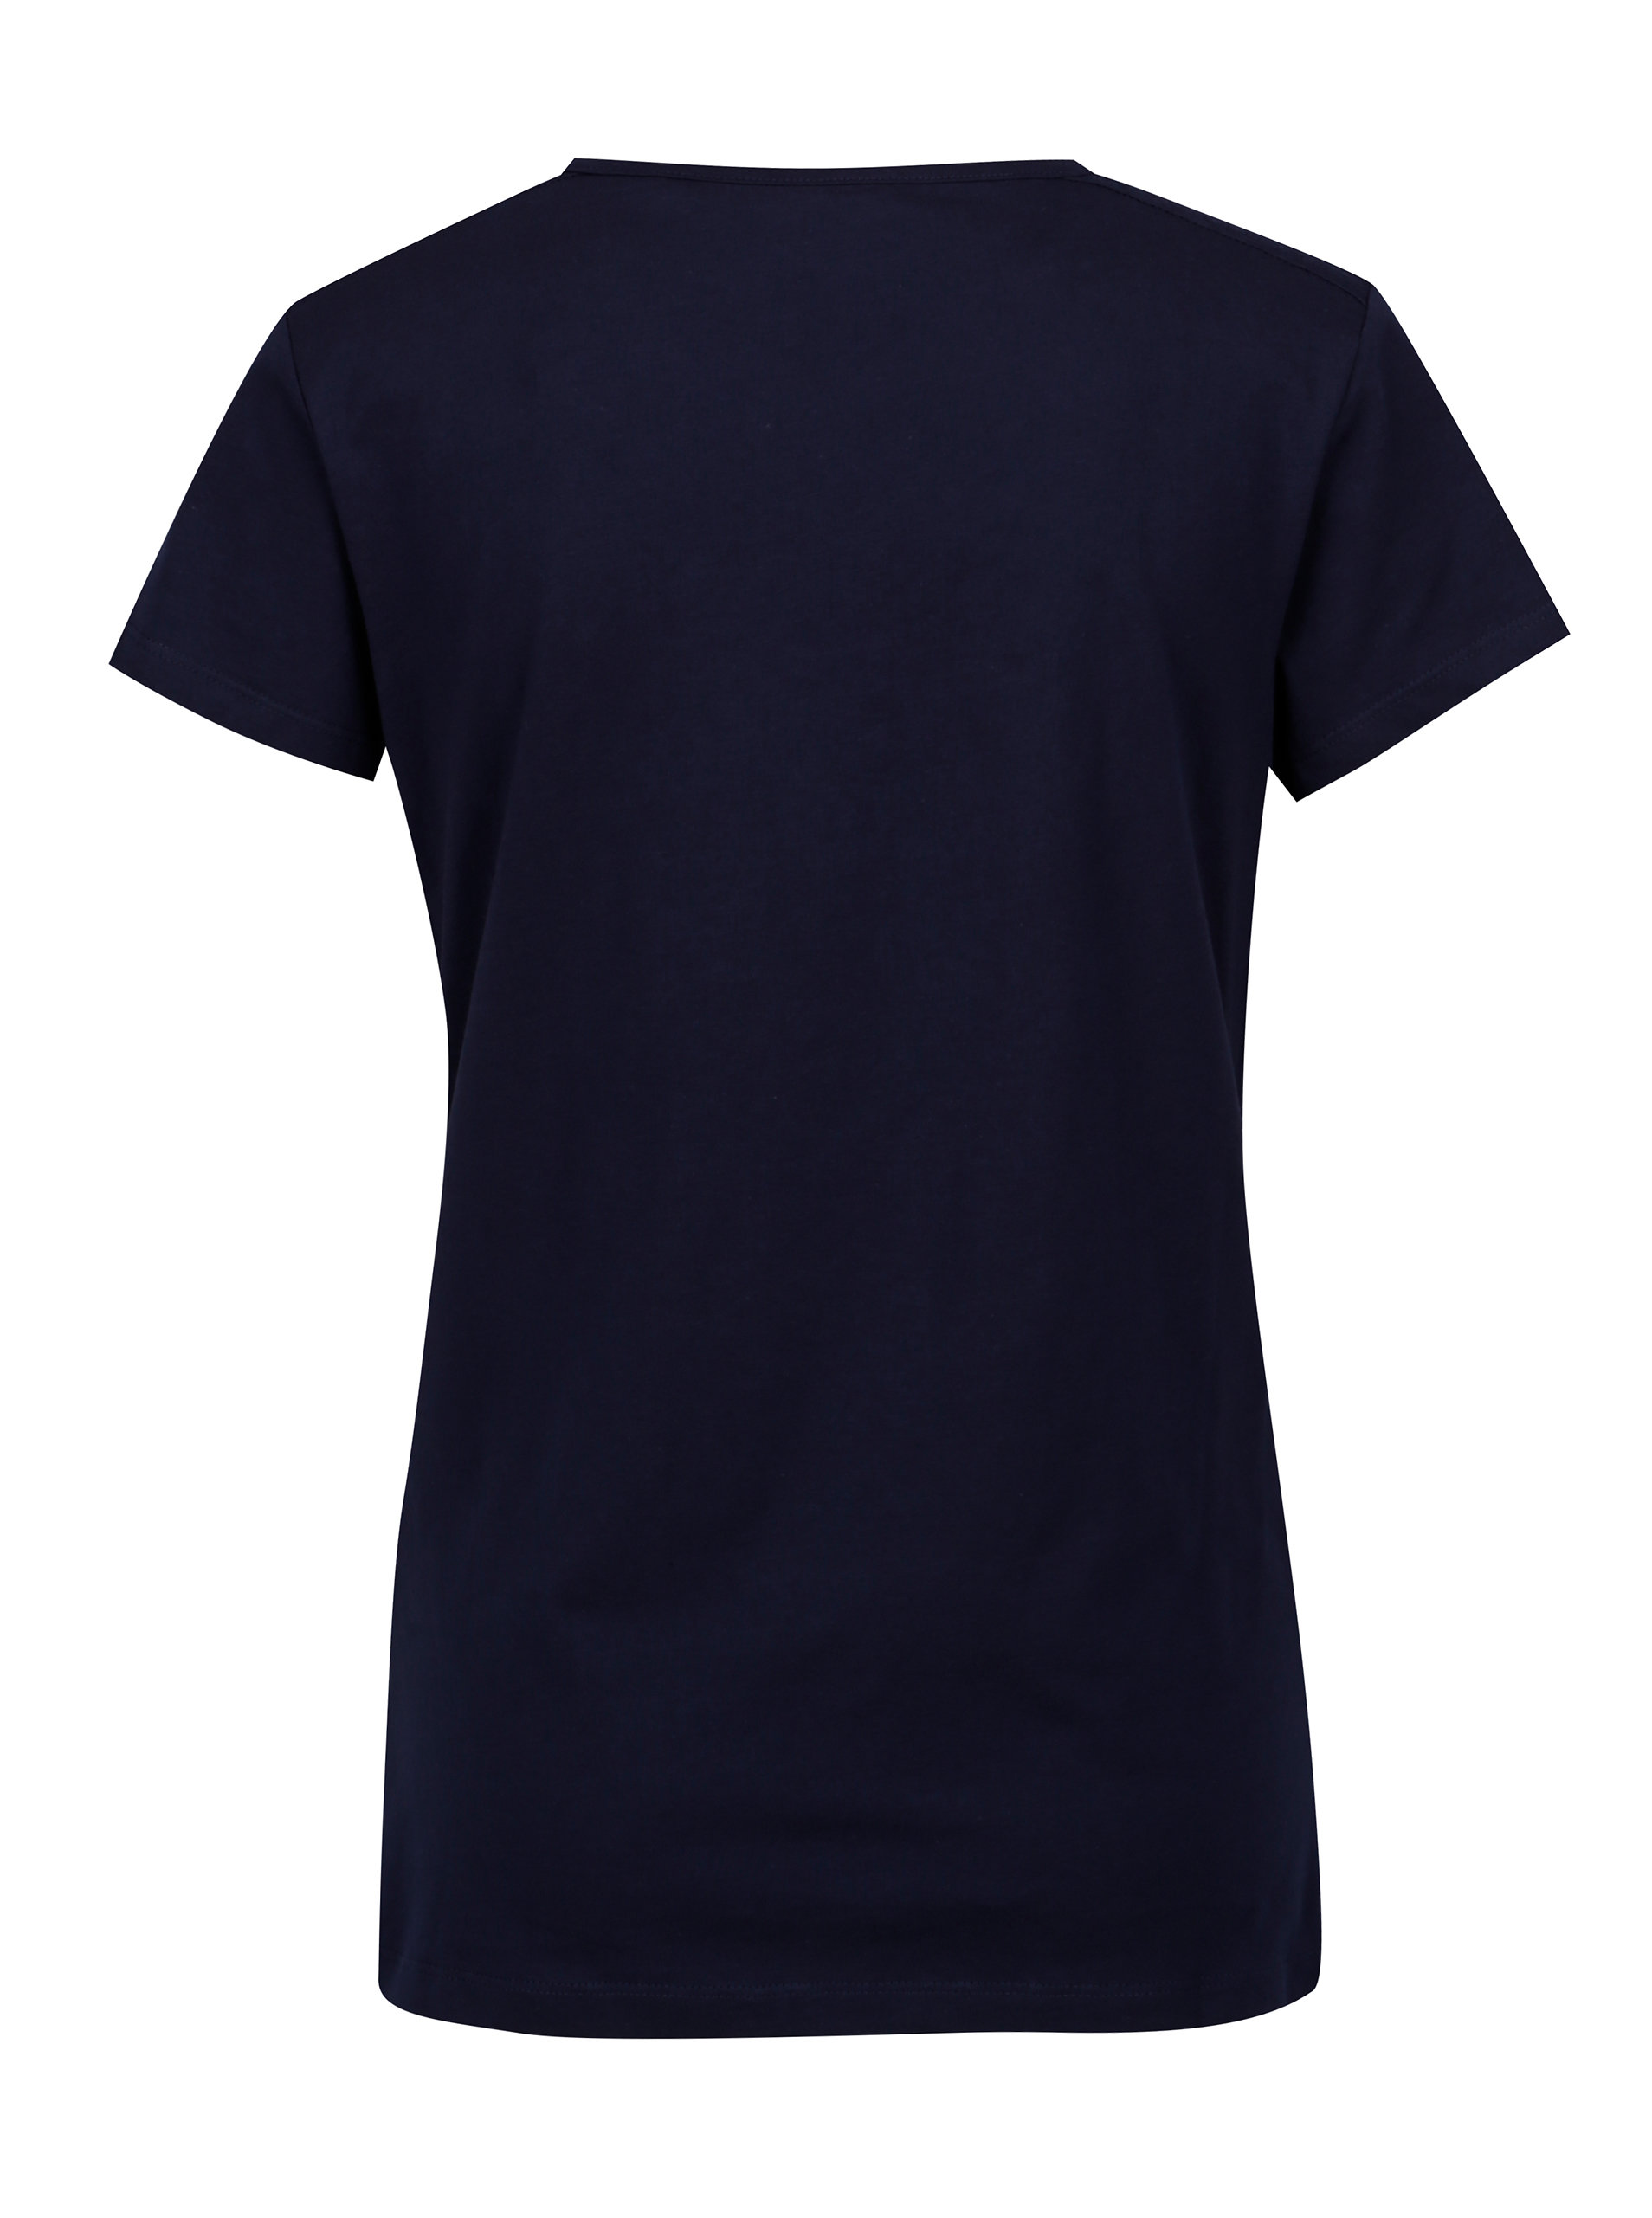 9cec6a80ad42 Tmavomodré dámske tričko s potlačou LOAP Abigale ...